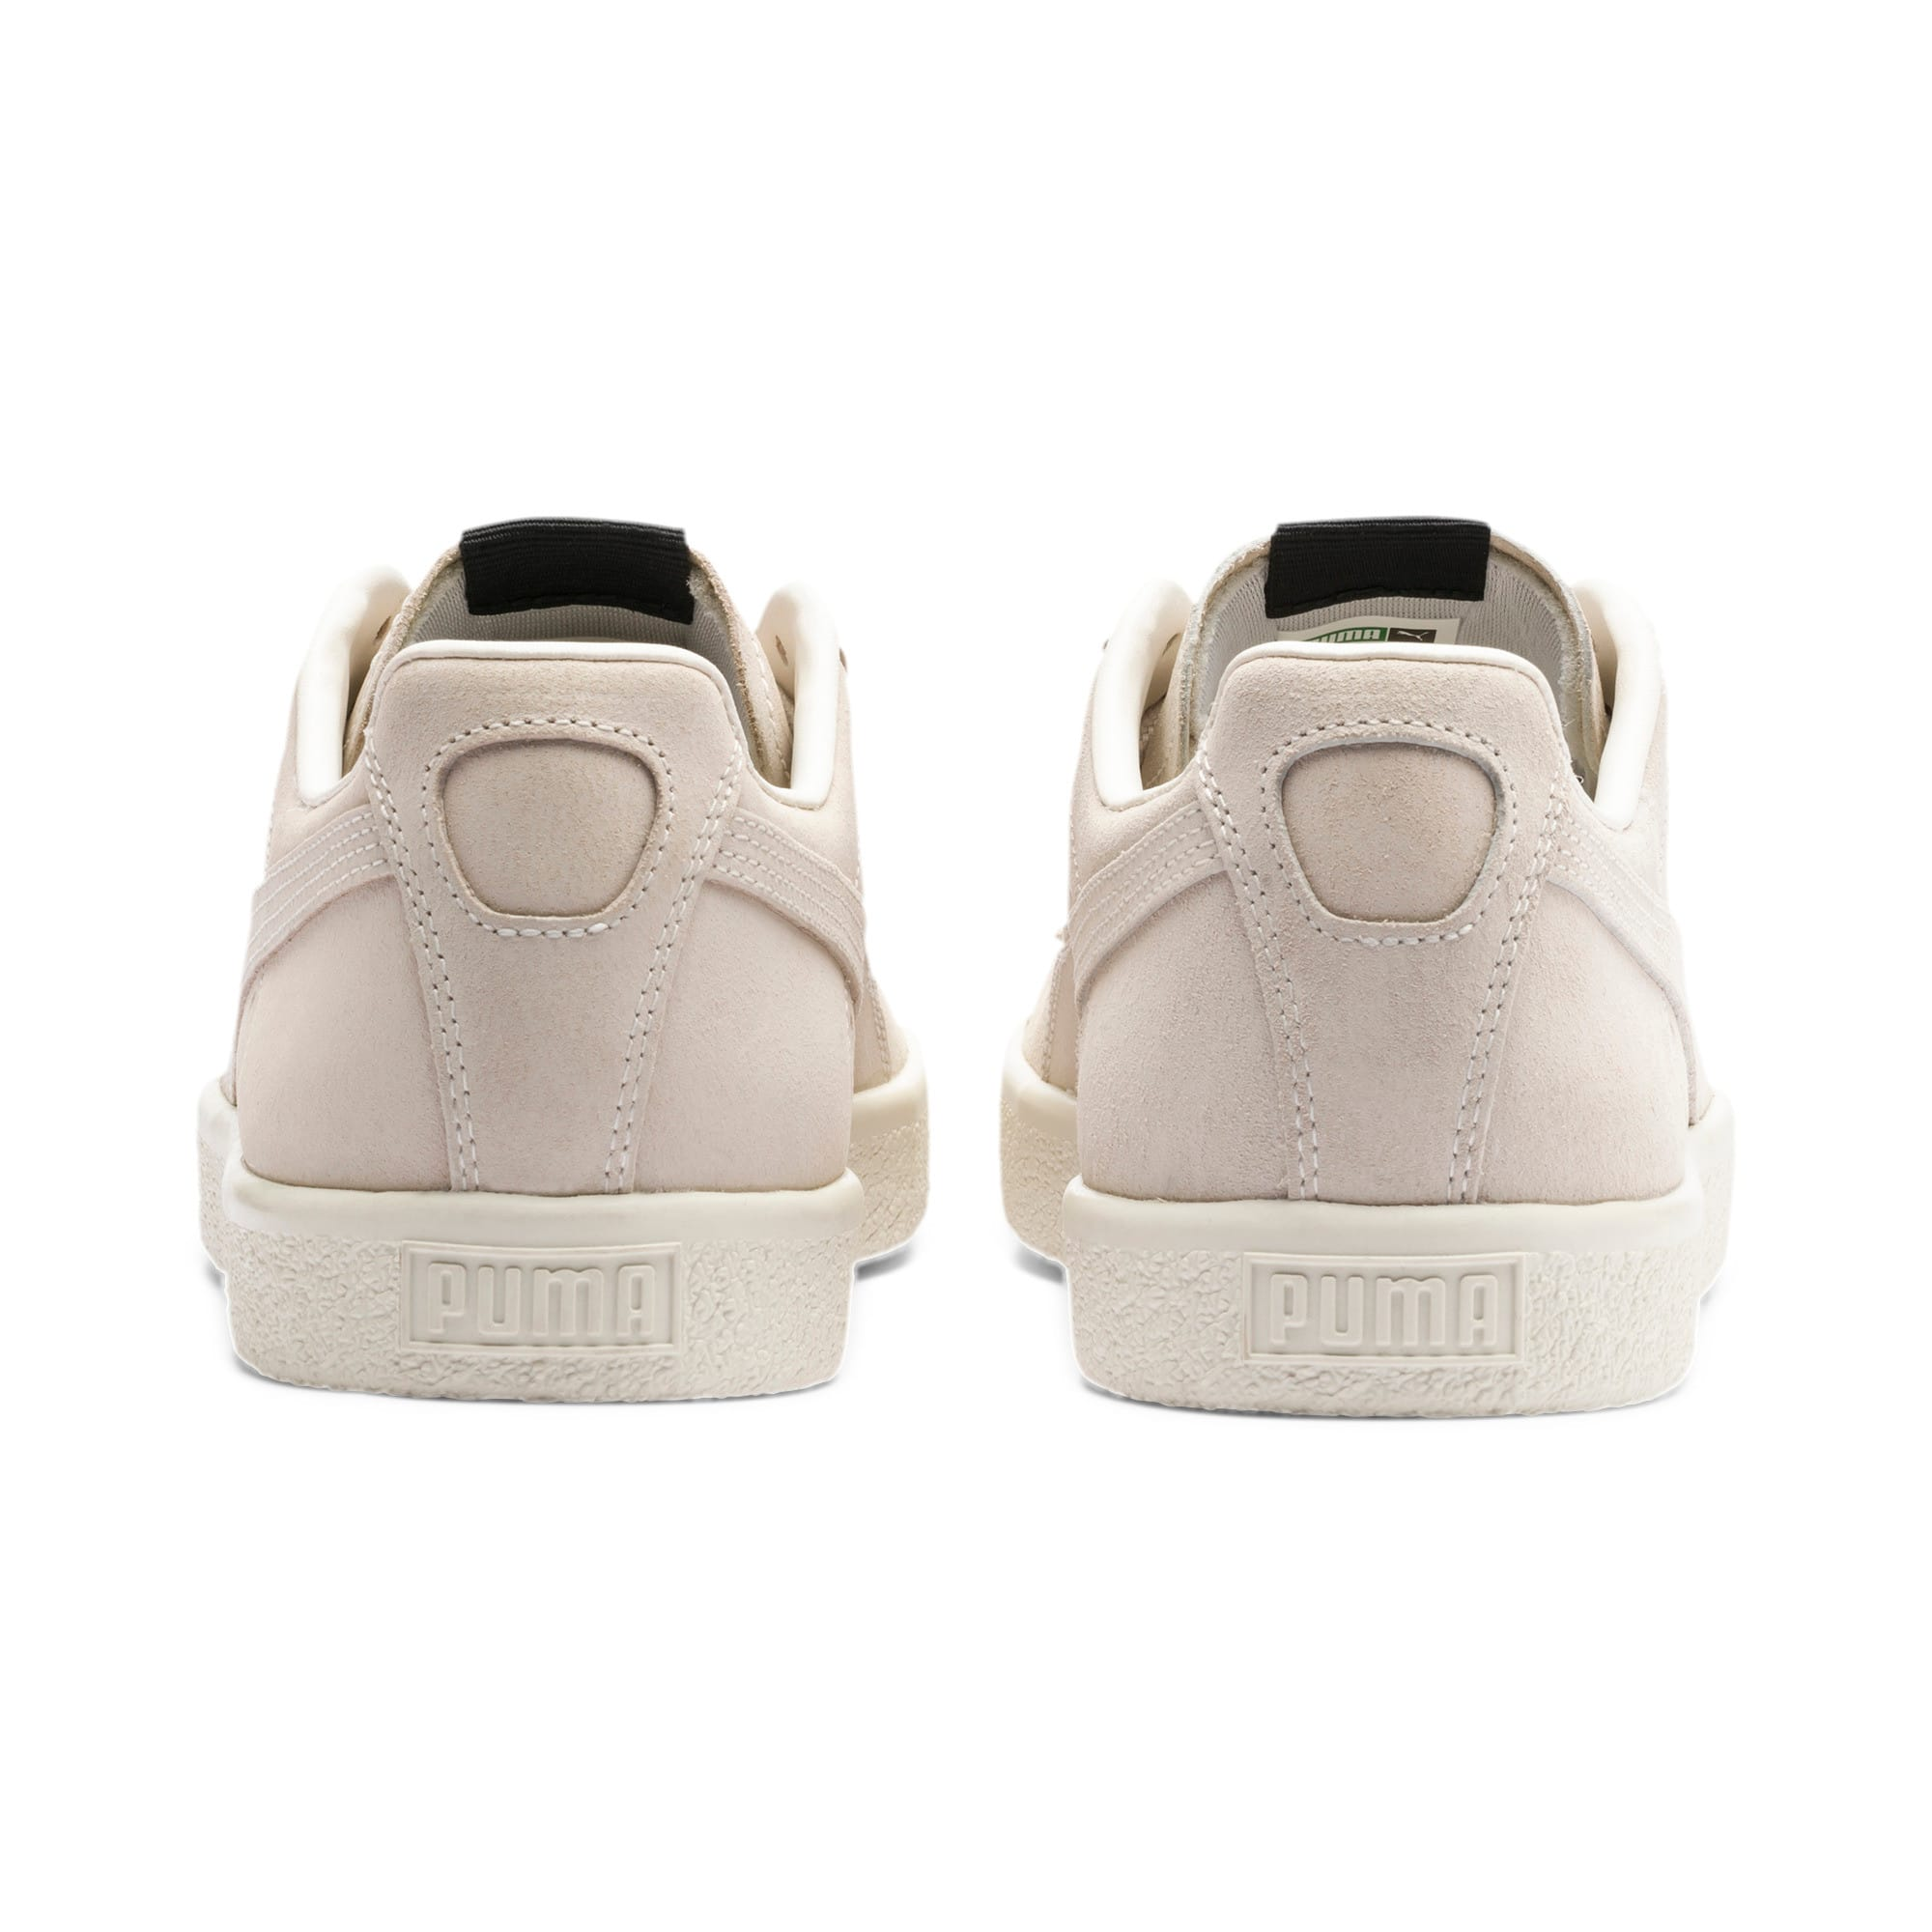 Thumbnail 5 of Clyde Fedora Sneakers, Whisper Wht-P Blk-WhisperWht, medium